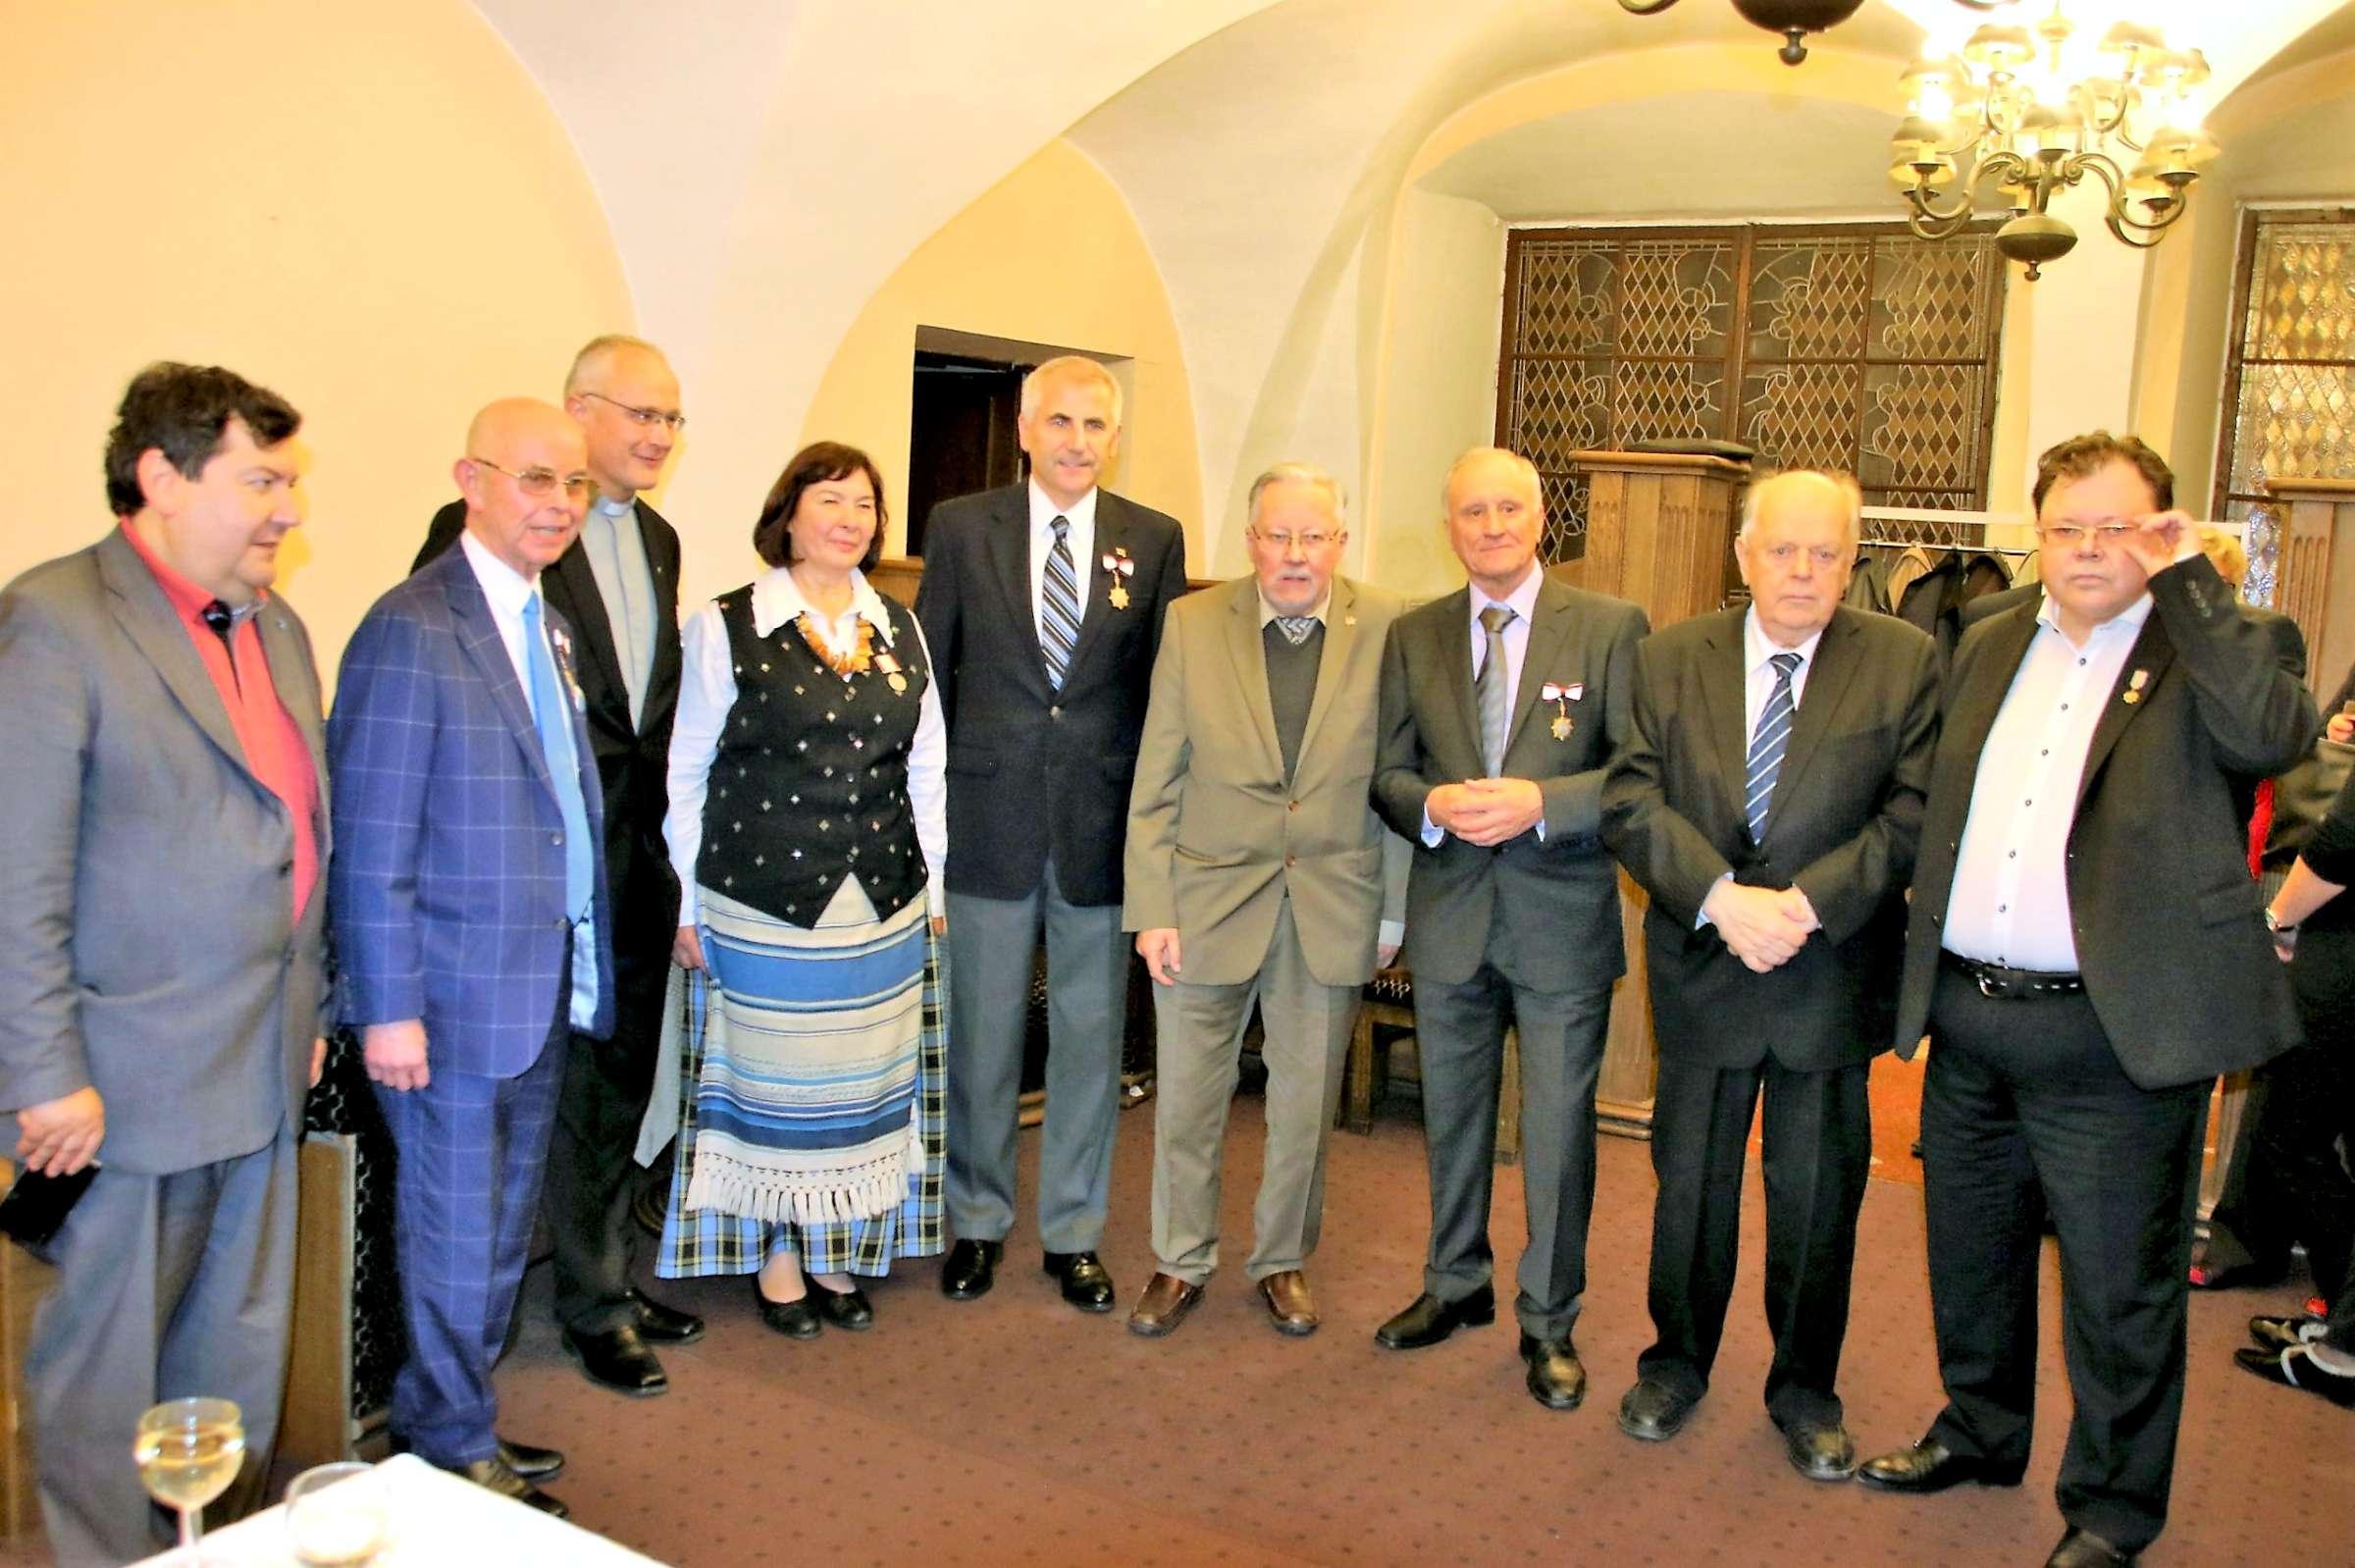 Iš kairės: E. Zingeris, A. Vinkus, kun. G. Vitkus, I. Burokienė, V. Ušackas, prof. V. Landsbergis, G. Burbulis, S. Šuškevičius, S. Povilaitis | J. Dingelio nuotr.